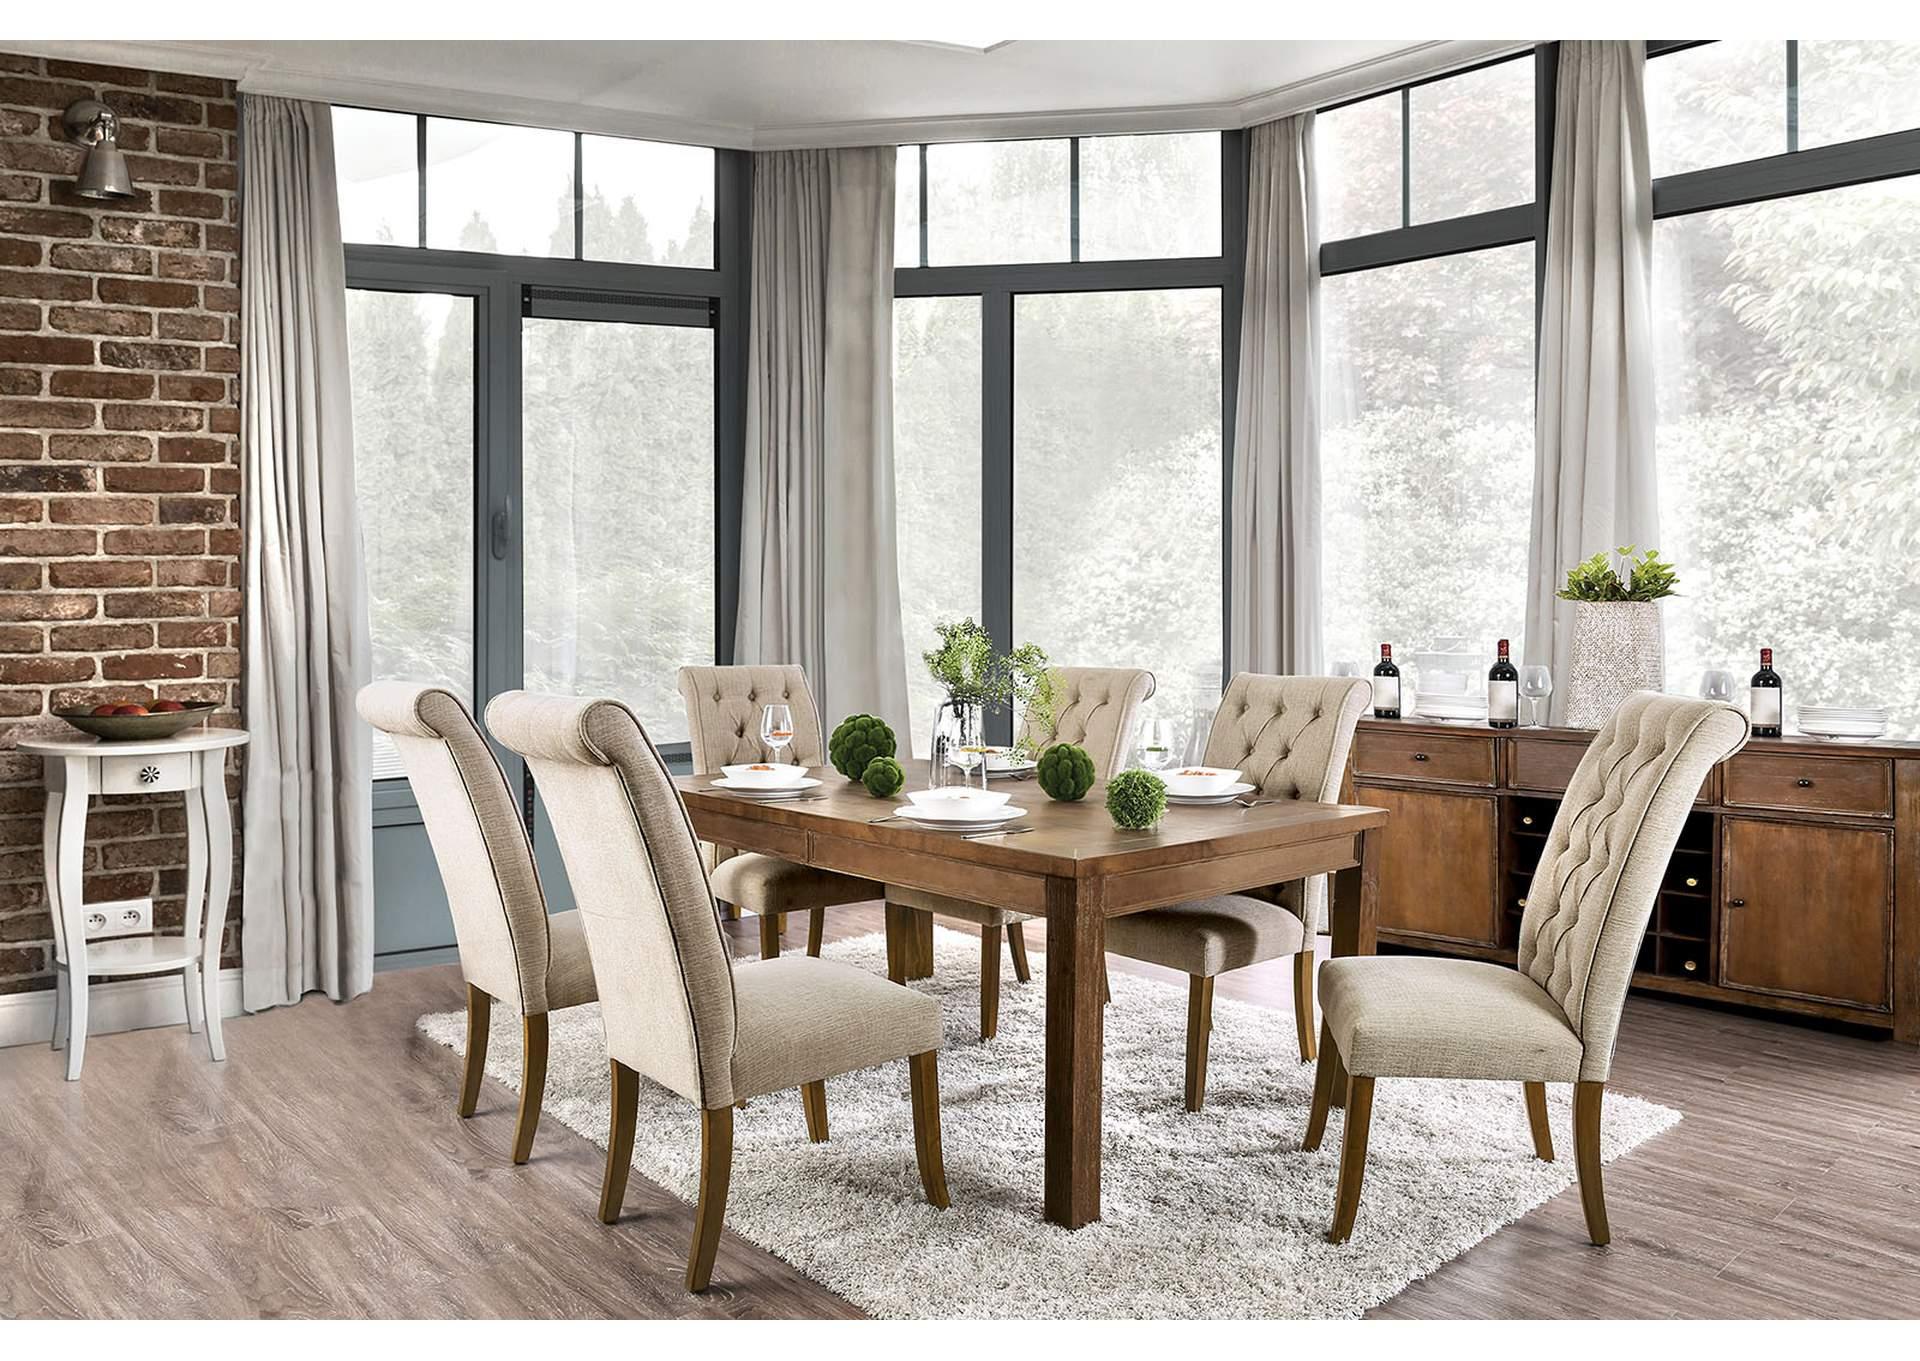 Sania Iii Rustic Oak Dining Table Lazy River Furniture